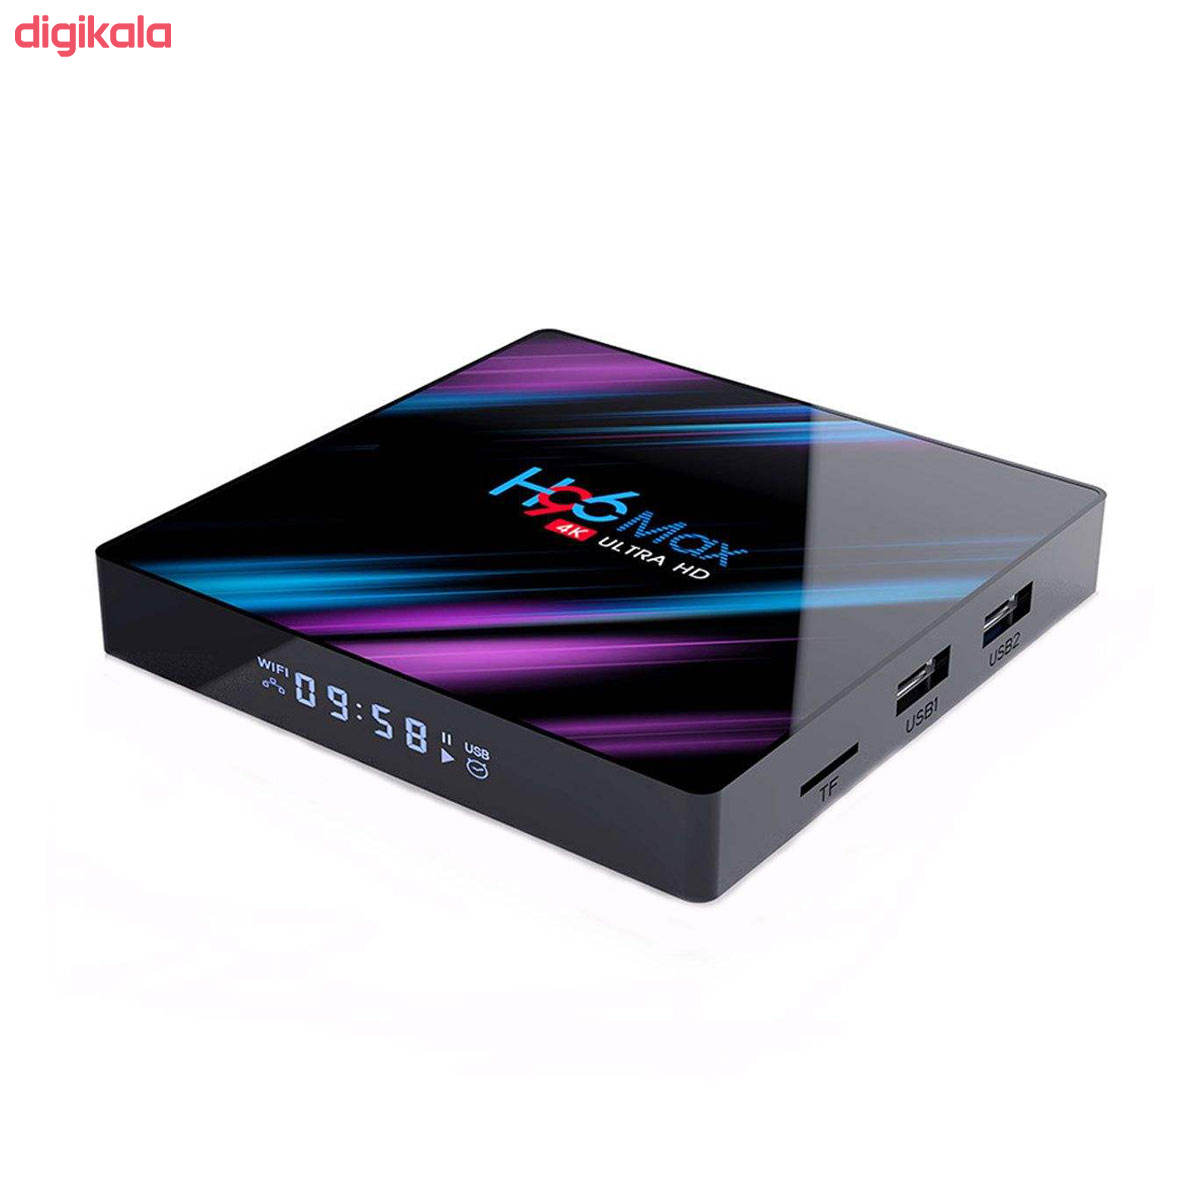 اندروید باکس اچ96 مدل مکس 4/32 - 3318 به همراه کیبورد هوشمند main 1 12